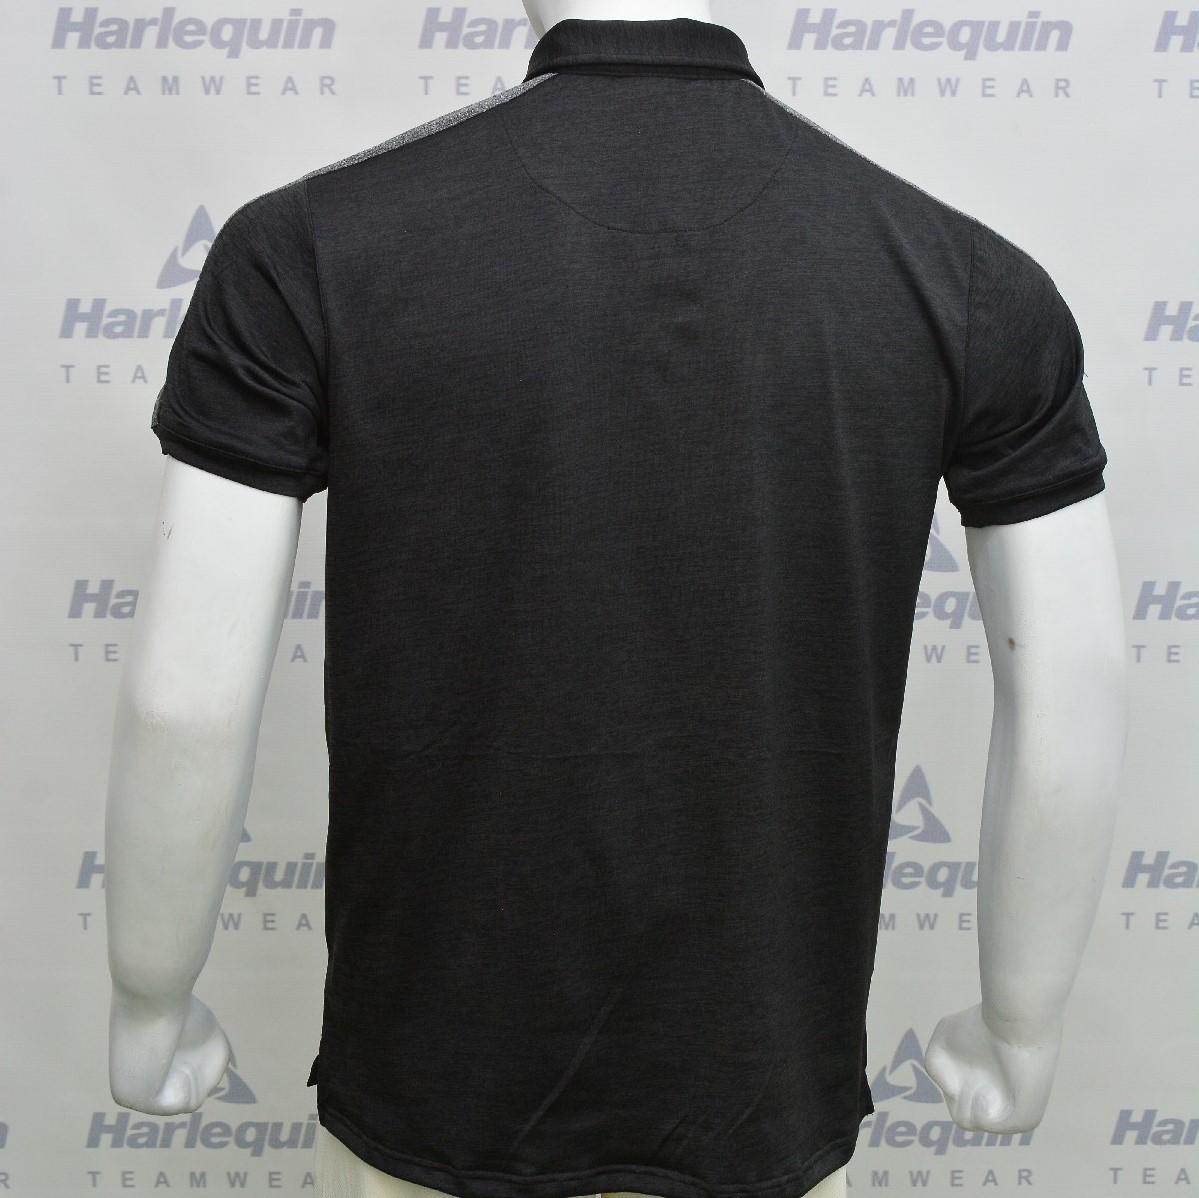 2020 Stafford Rangers Leisure Polo Shirt (Adult)